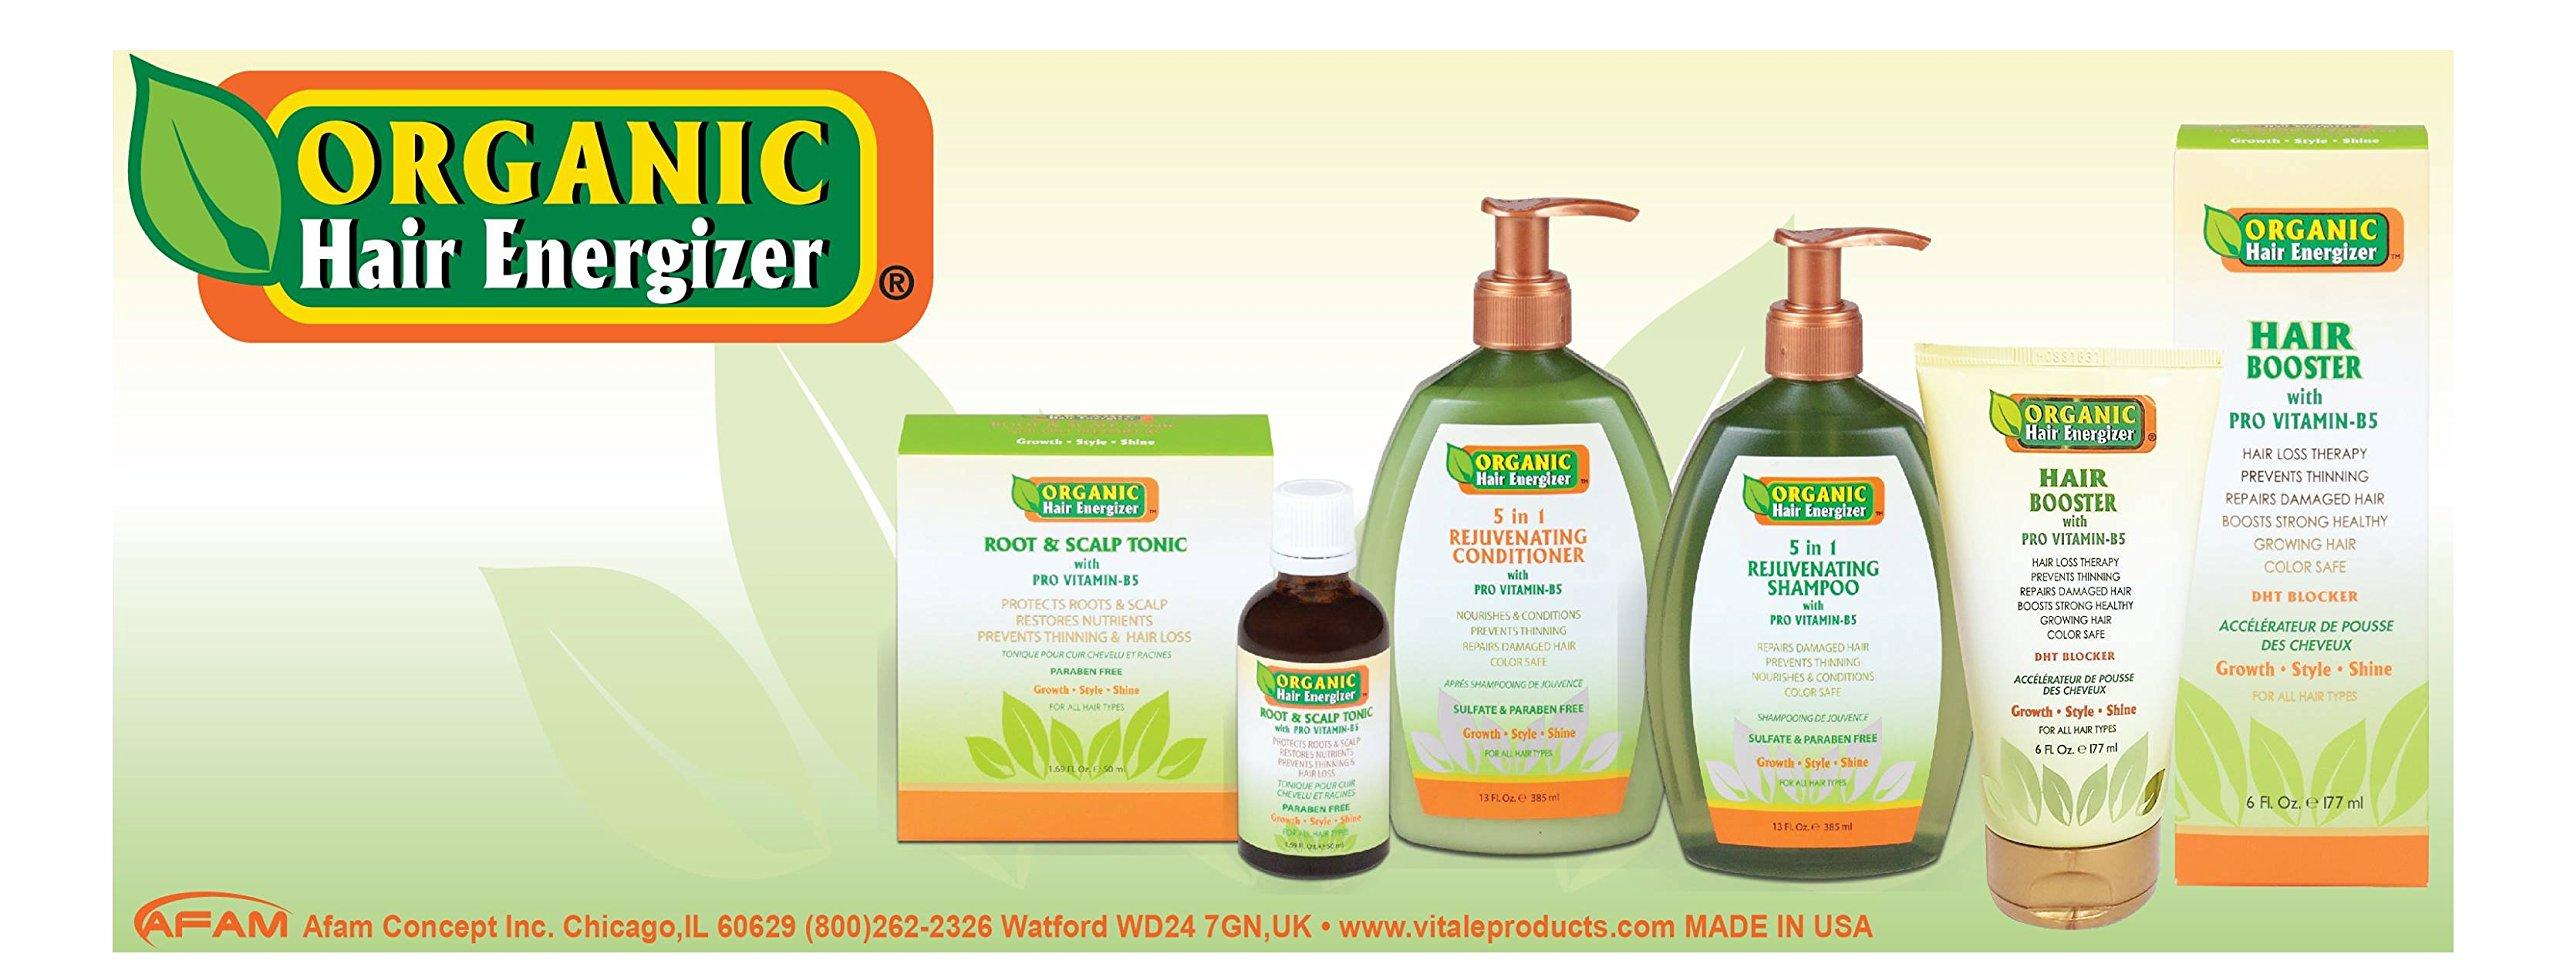 Organic Hair Energizer Root & Scalp Pro Vitamin-B5 Hair Growth Tonic, 1.69 oz | DHT-Blockers, Sulfate-Free & Paraben-Free, Prevent Hair Loss, Thinning & Receding Hair Line | Good For Men & Women by Organic Hair Energizer